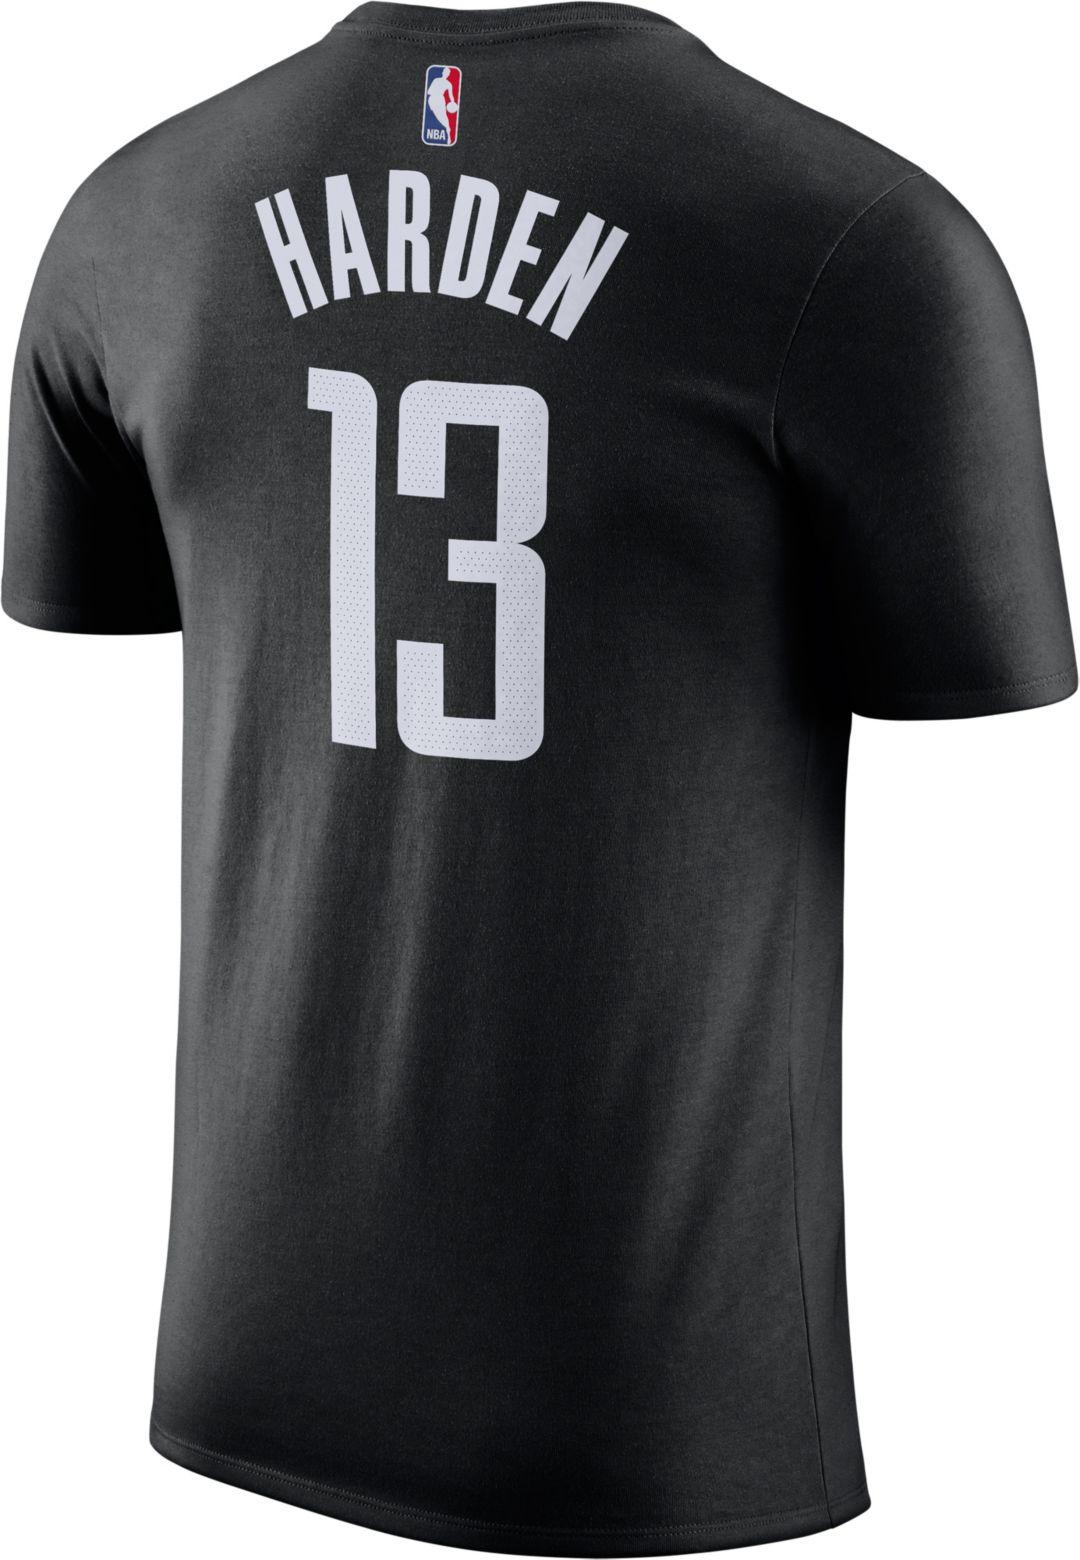 official photos 992fa 7bb28 Nike Youth Houston Rockets James Harden #13 Dri-FIT Black T-Shirt